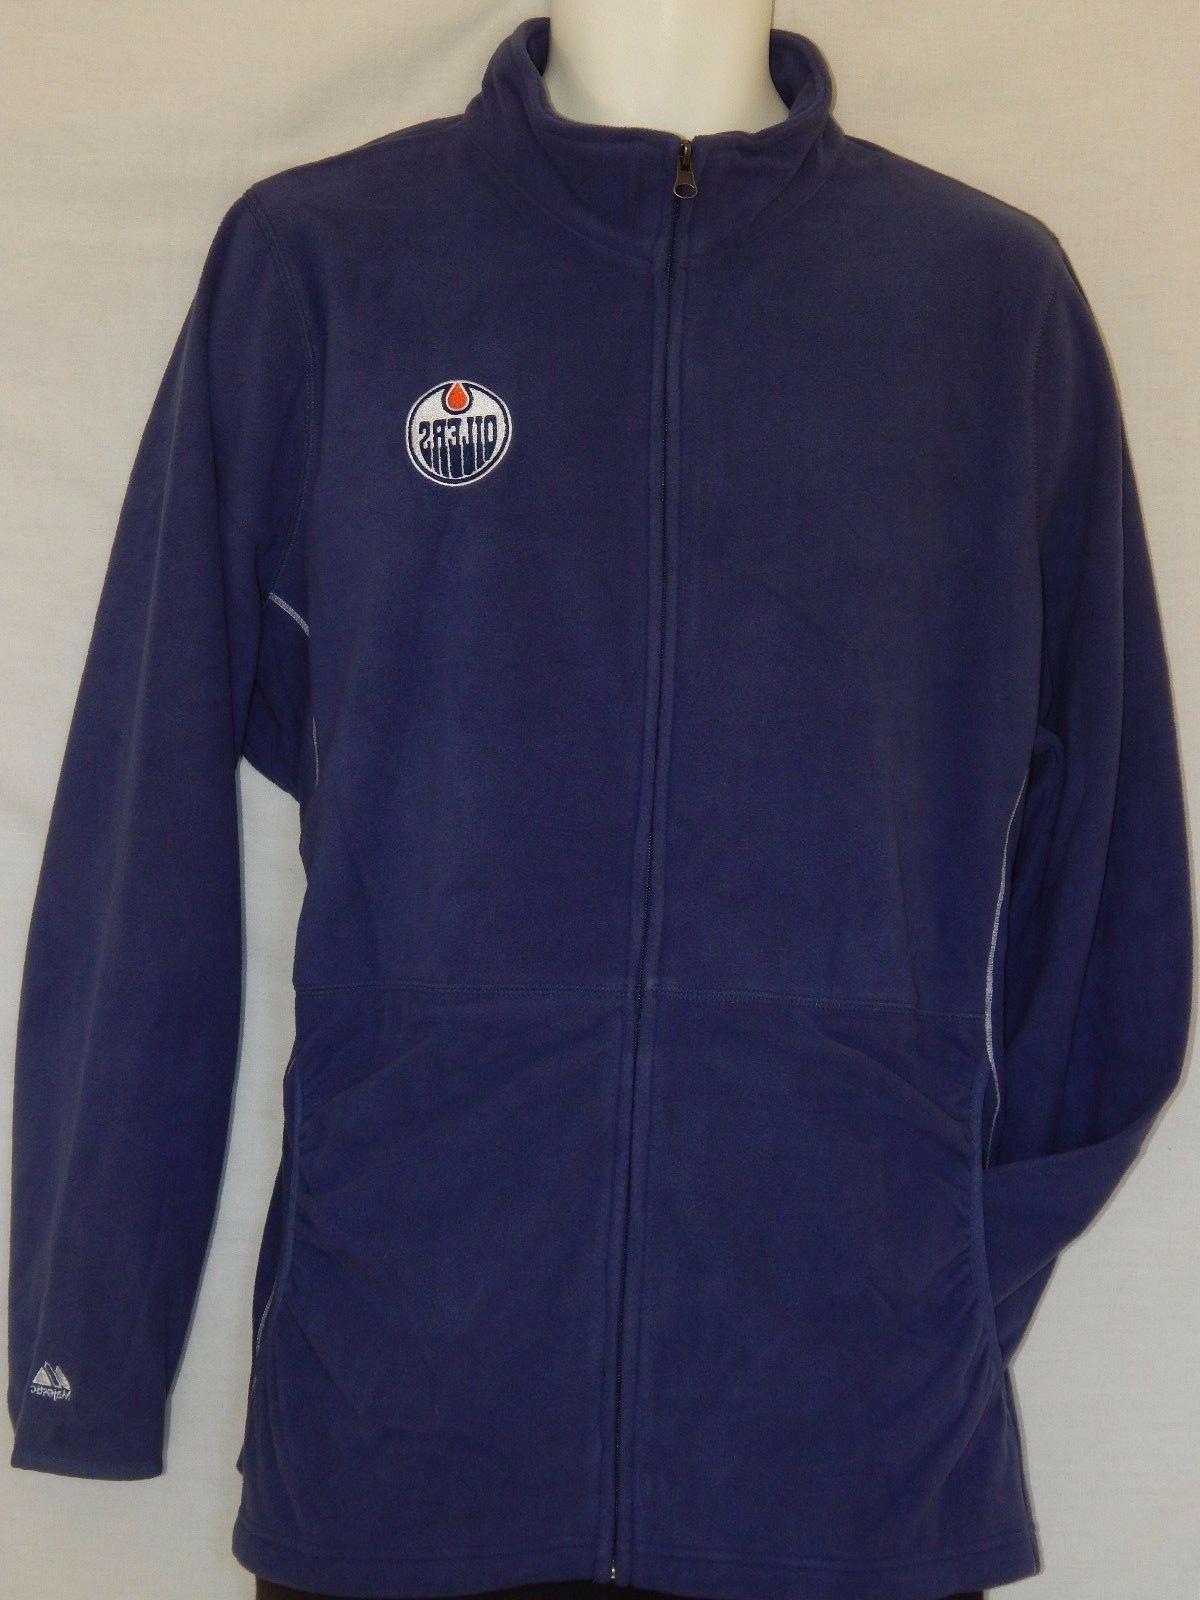 new edmonton oilers hockey zip up jacket